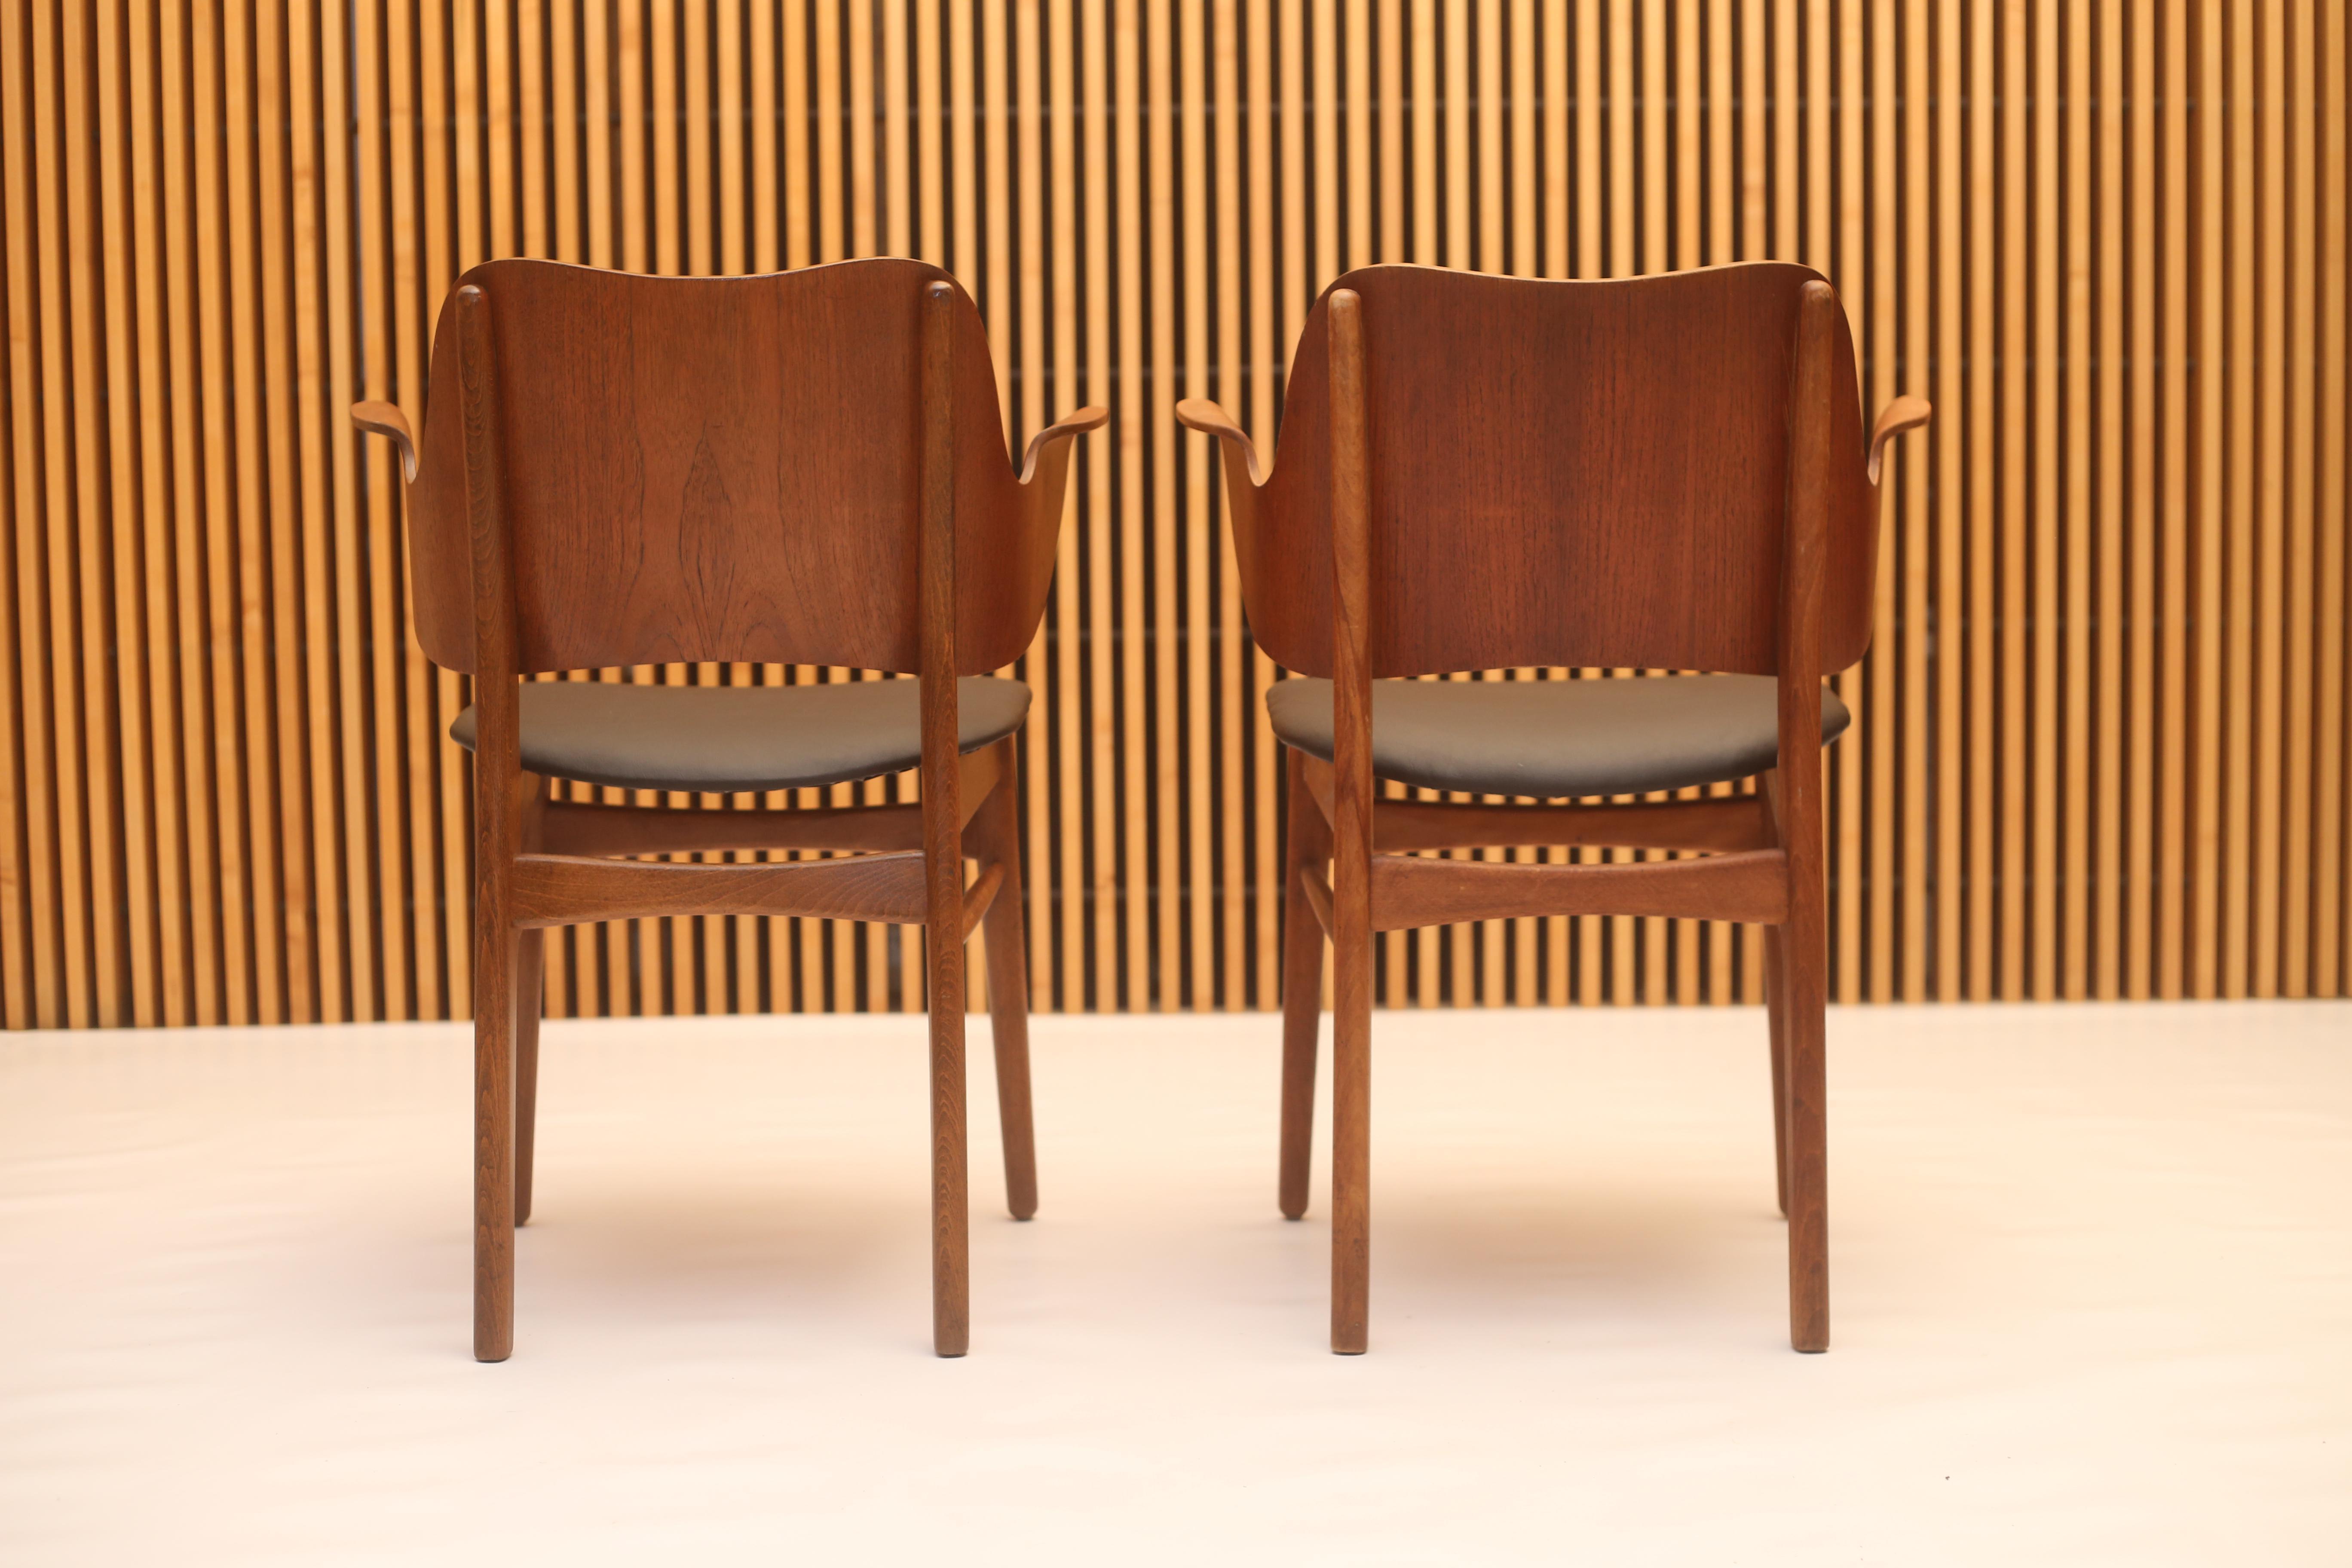 Wonderful Hans Olsen Style Danish Modern Teak Dining Chairs   Set Of 4   Image 3 Of